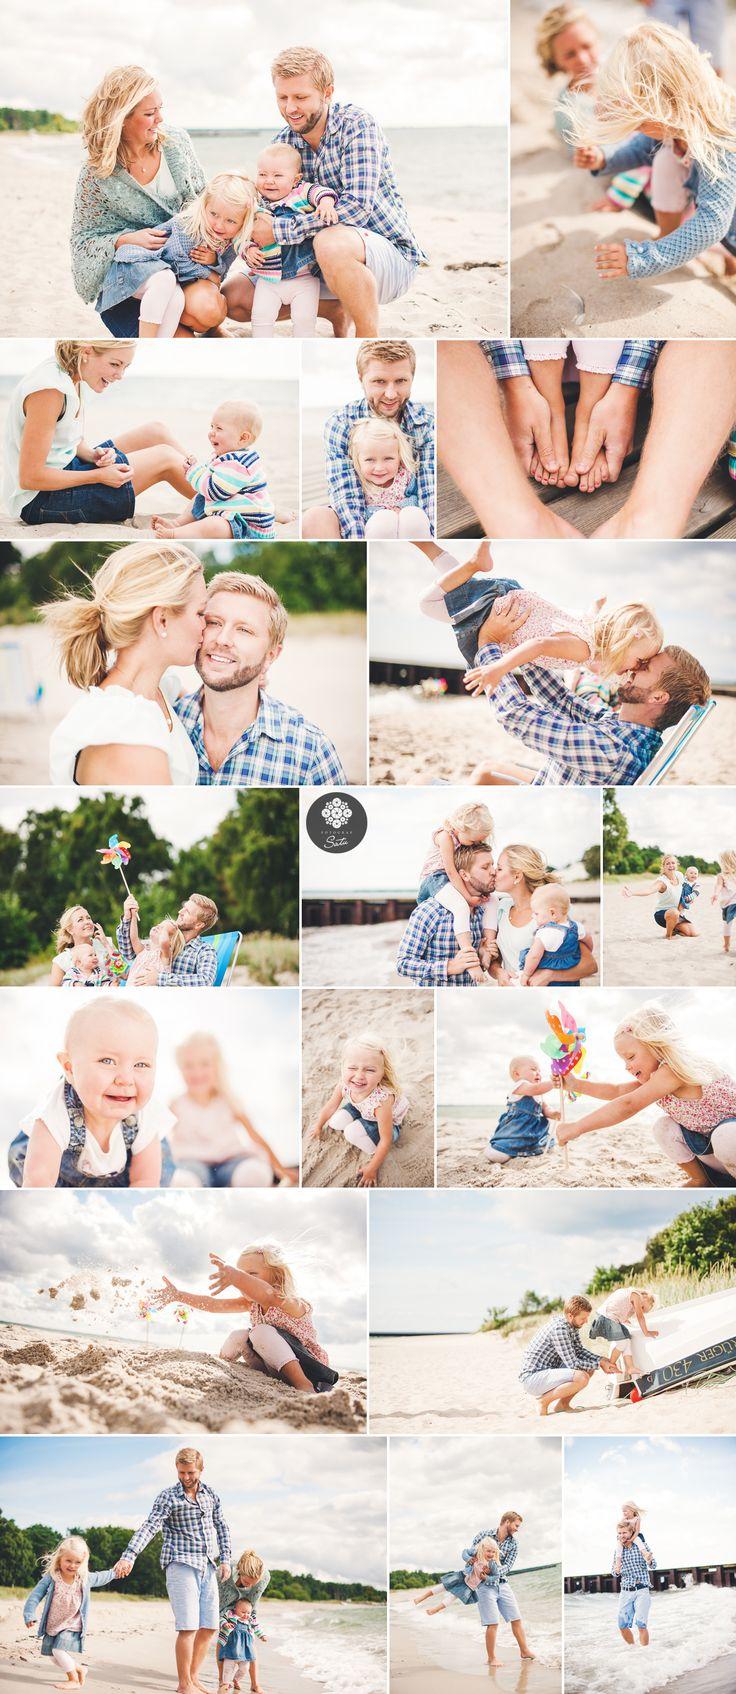 © satu knape 2013 familjefotografering i linköping sverige  Family <3